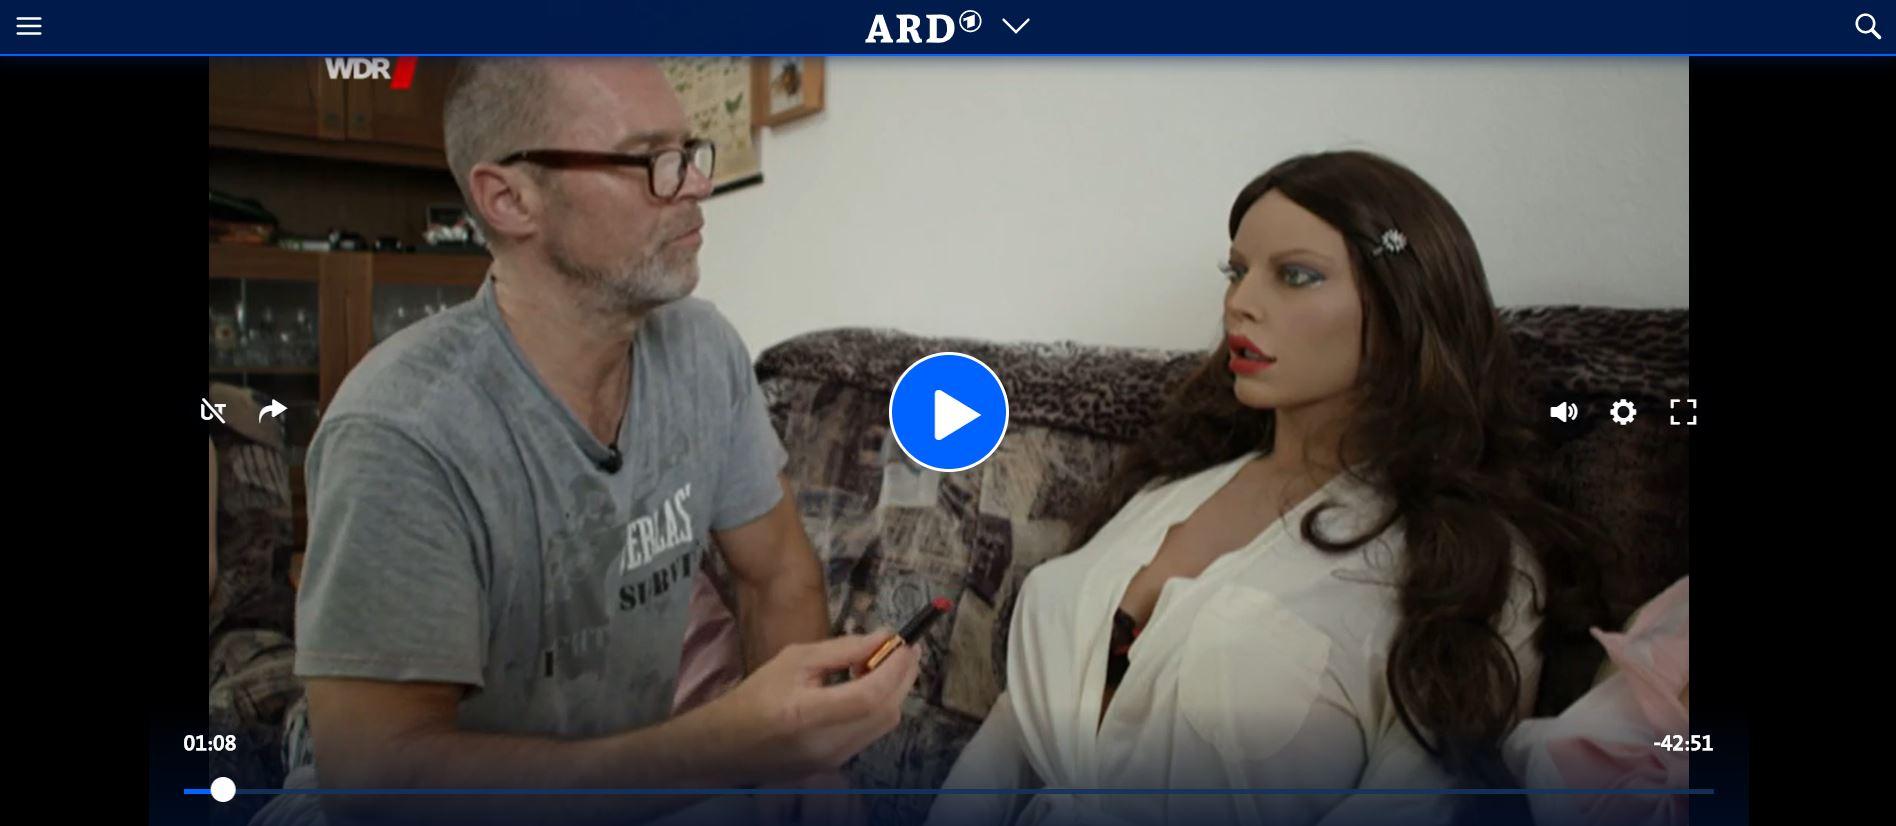 WDR-Doku: Wenn Menschen Puppen lieben